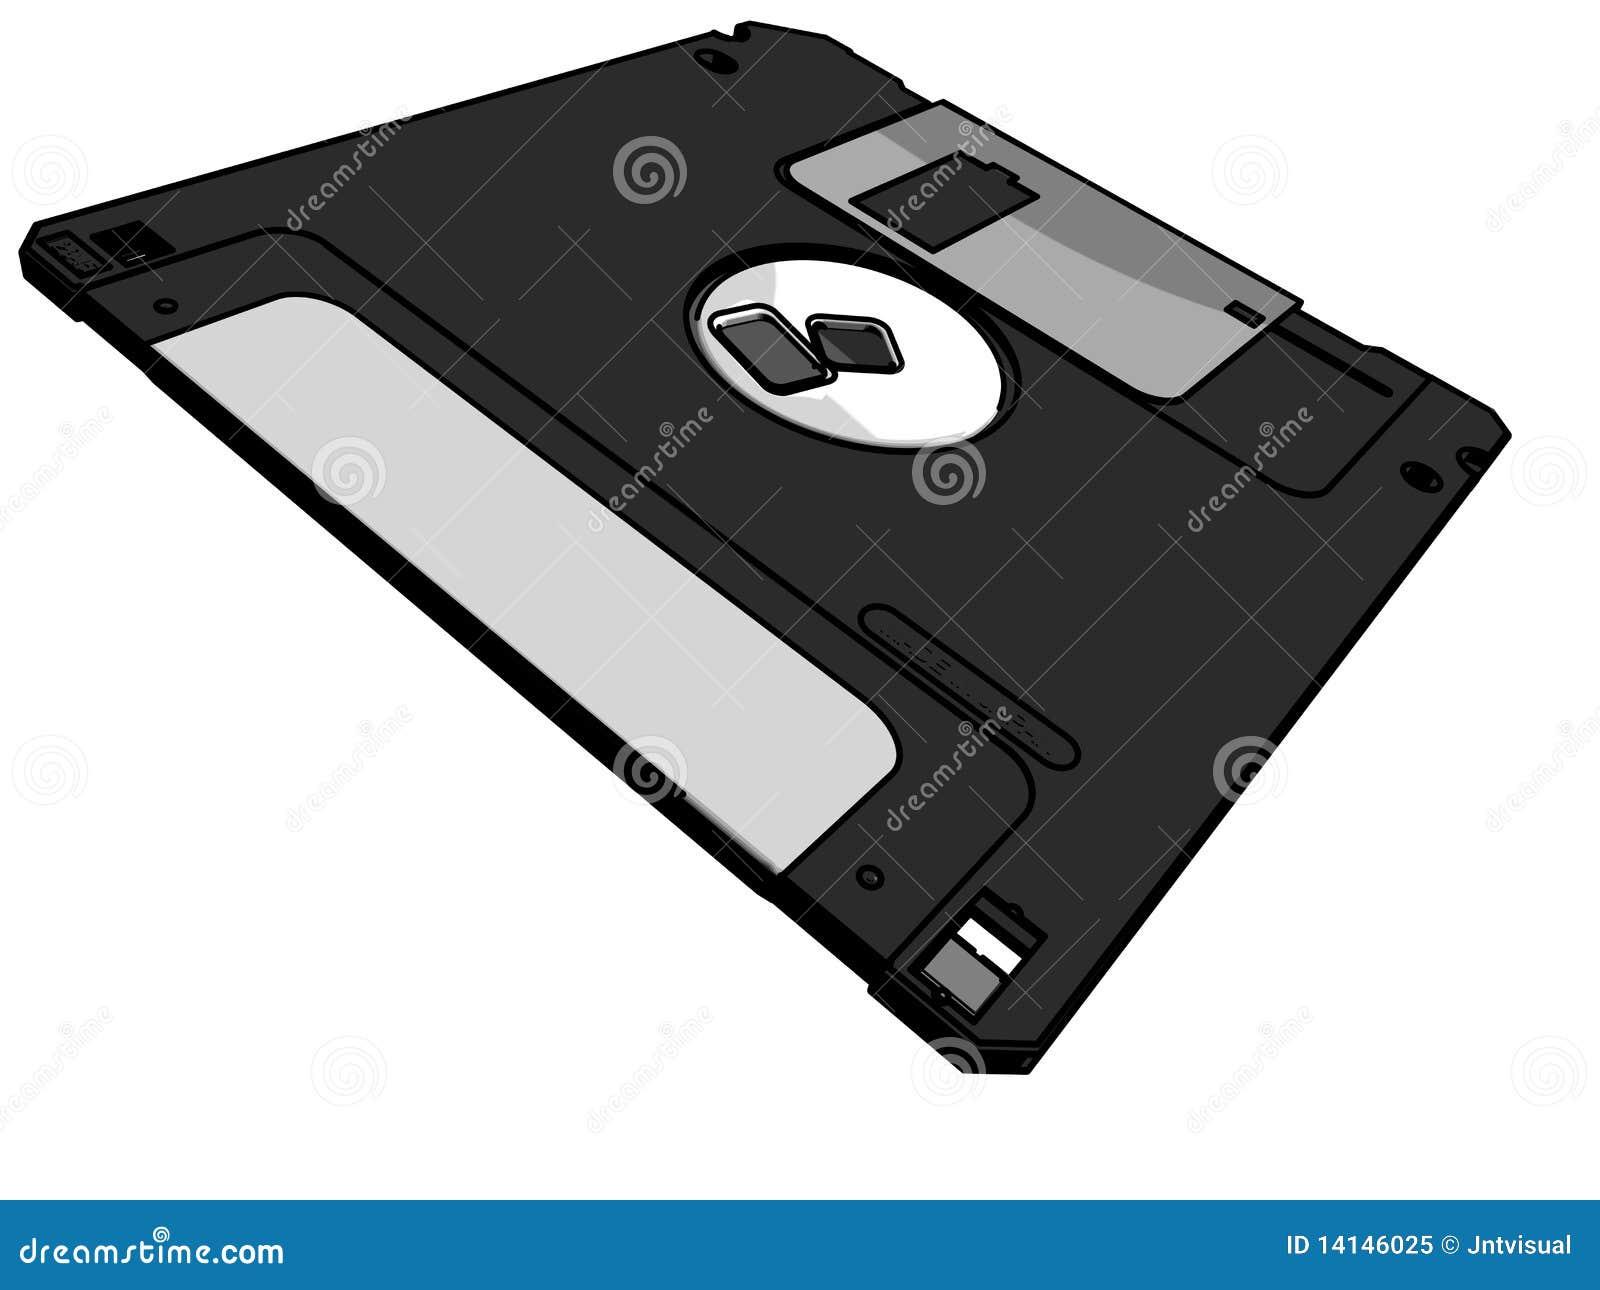 3 5 floppy disk royalty free stock photo image 14146025. Black Bedroom Furniture Sets. Home Design Ideas